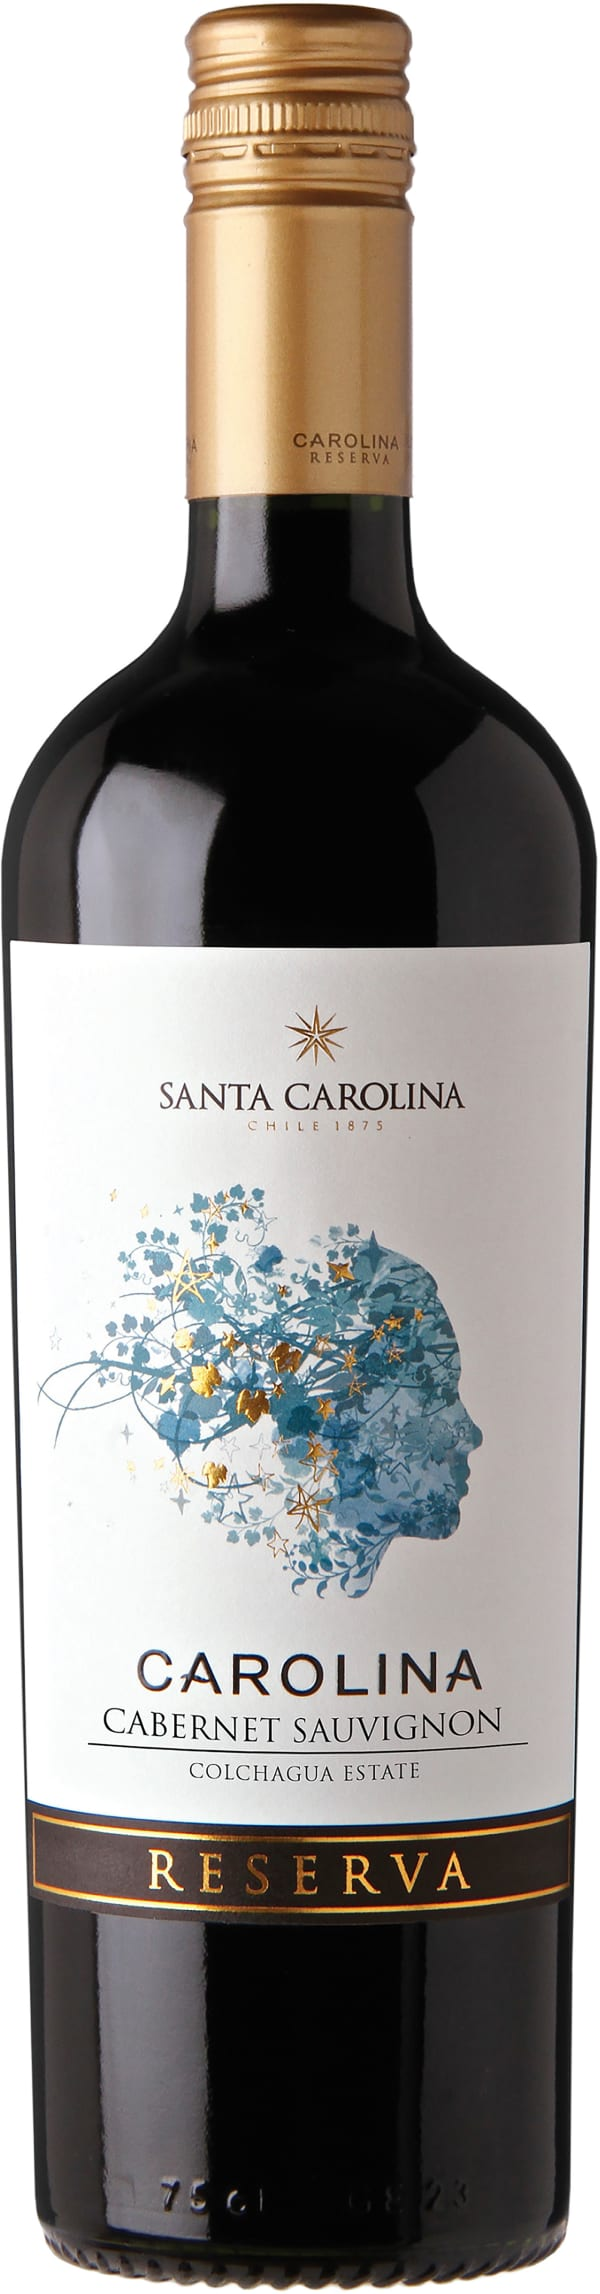 Santa Carolina Cabernet Sauvignon Reserva 2016